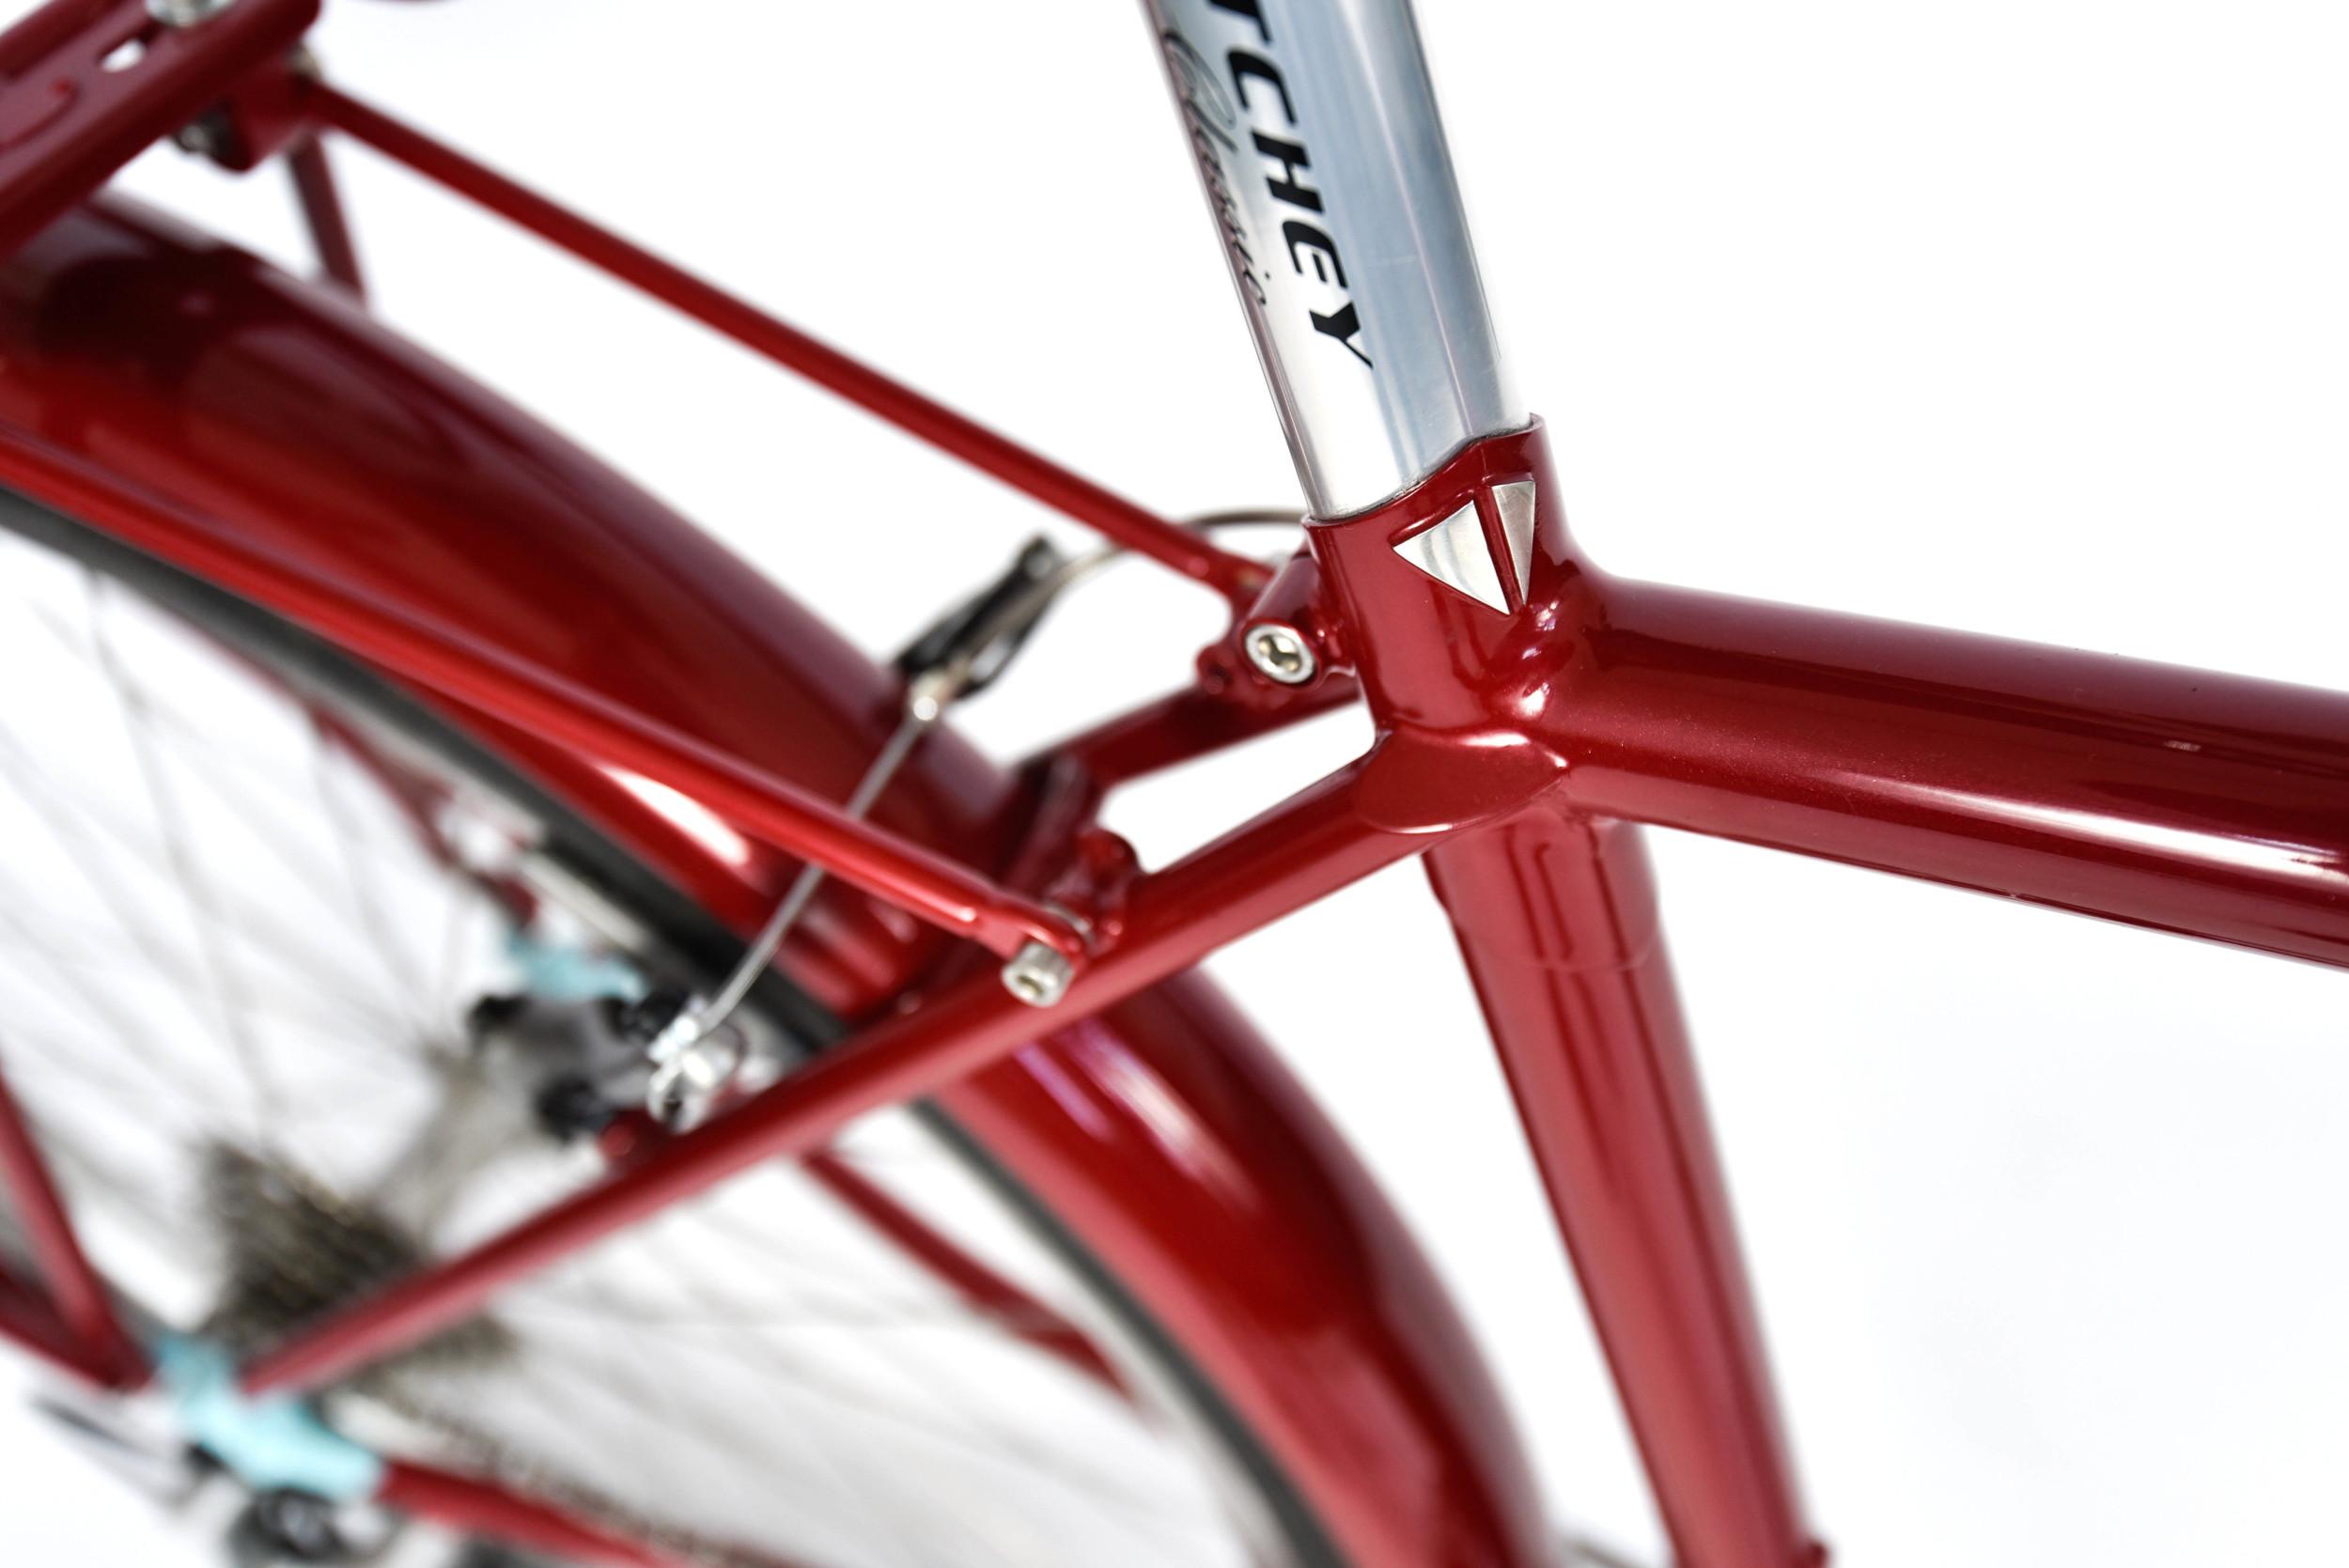 853 mini touring bike bespoke custom seat cluster detail